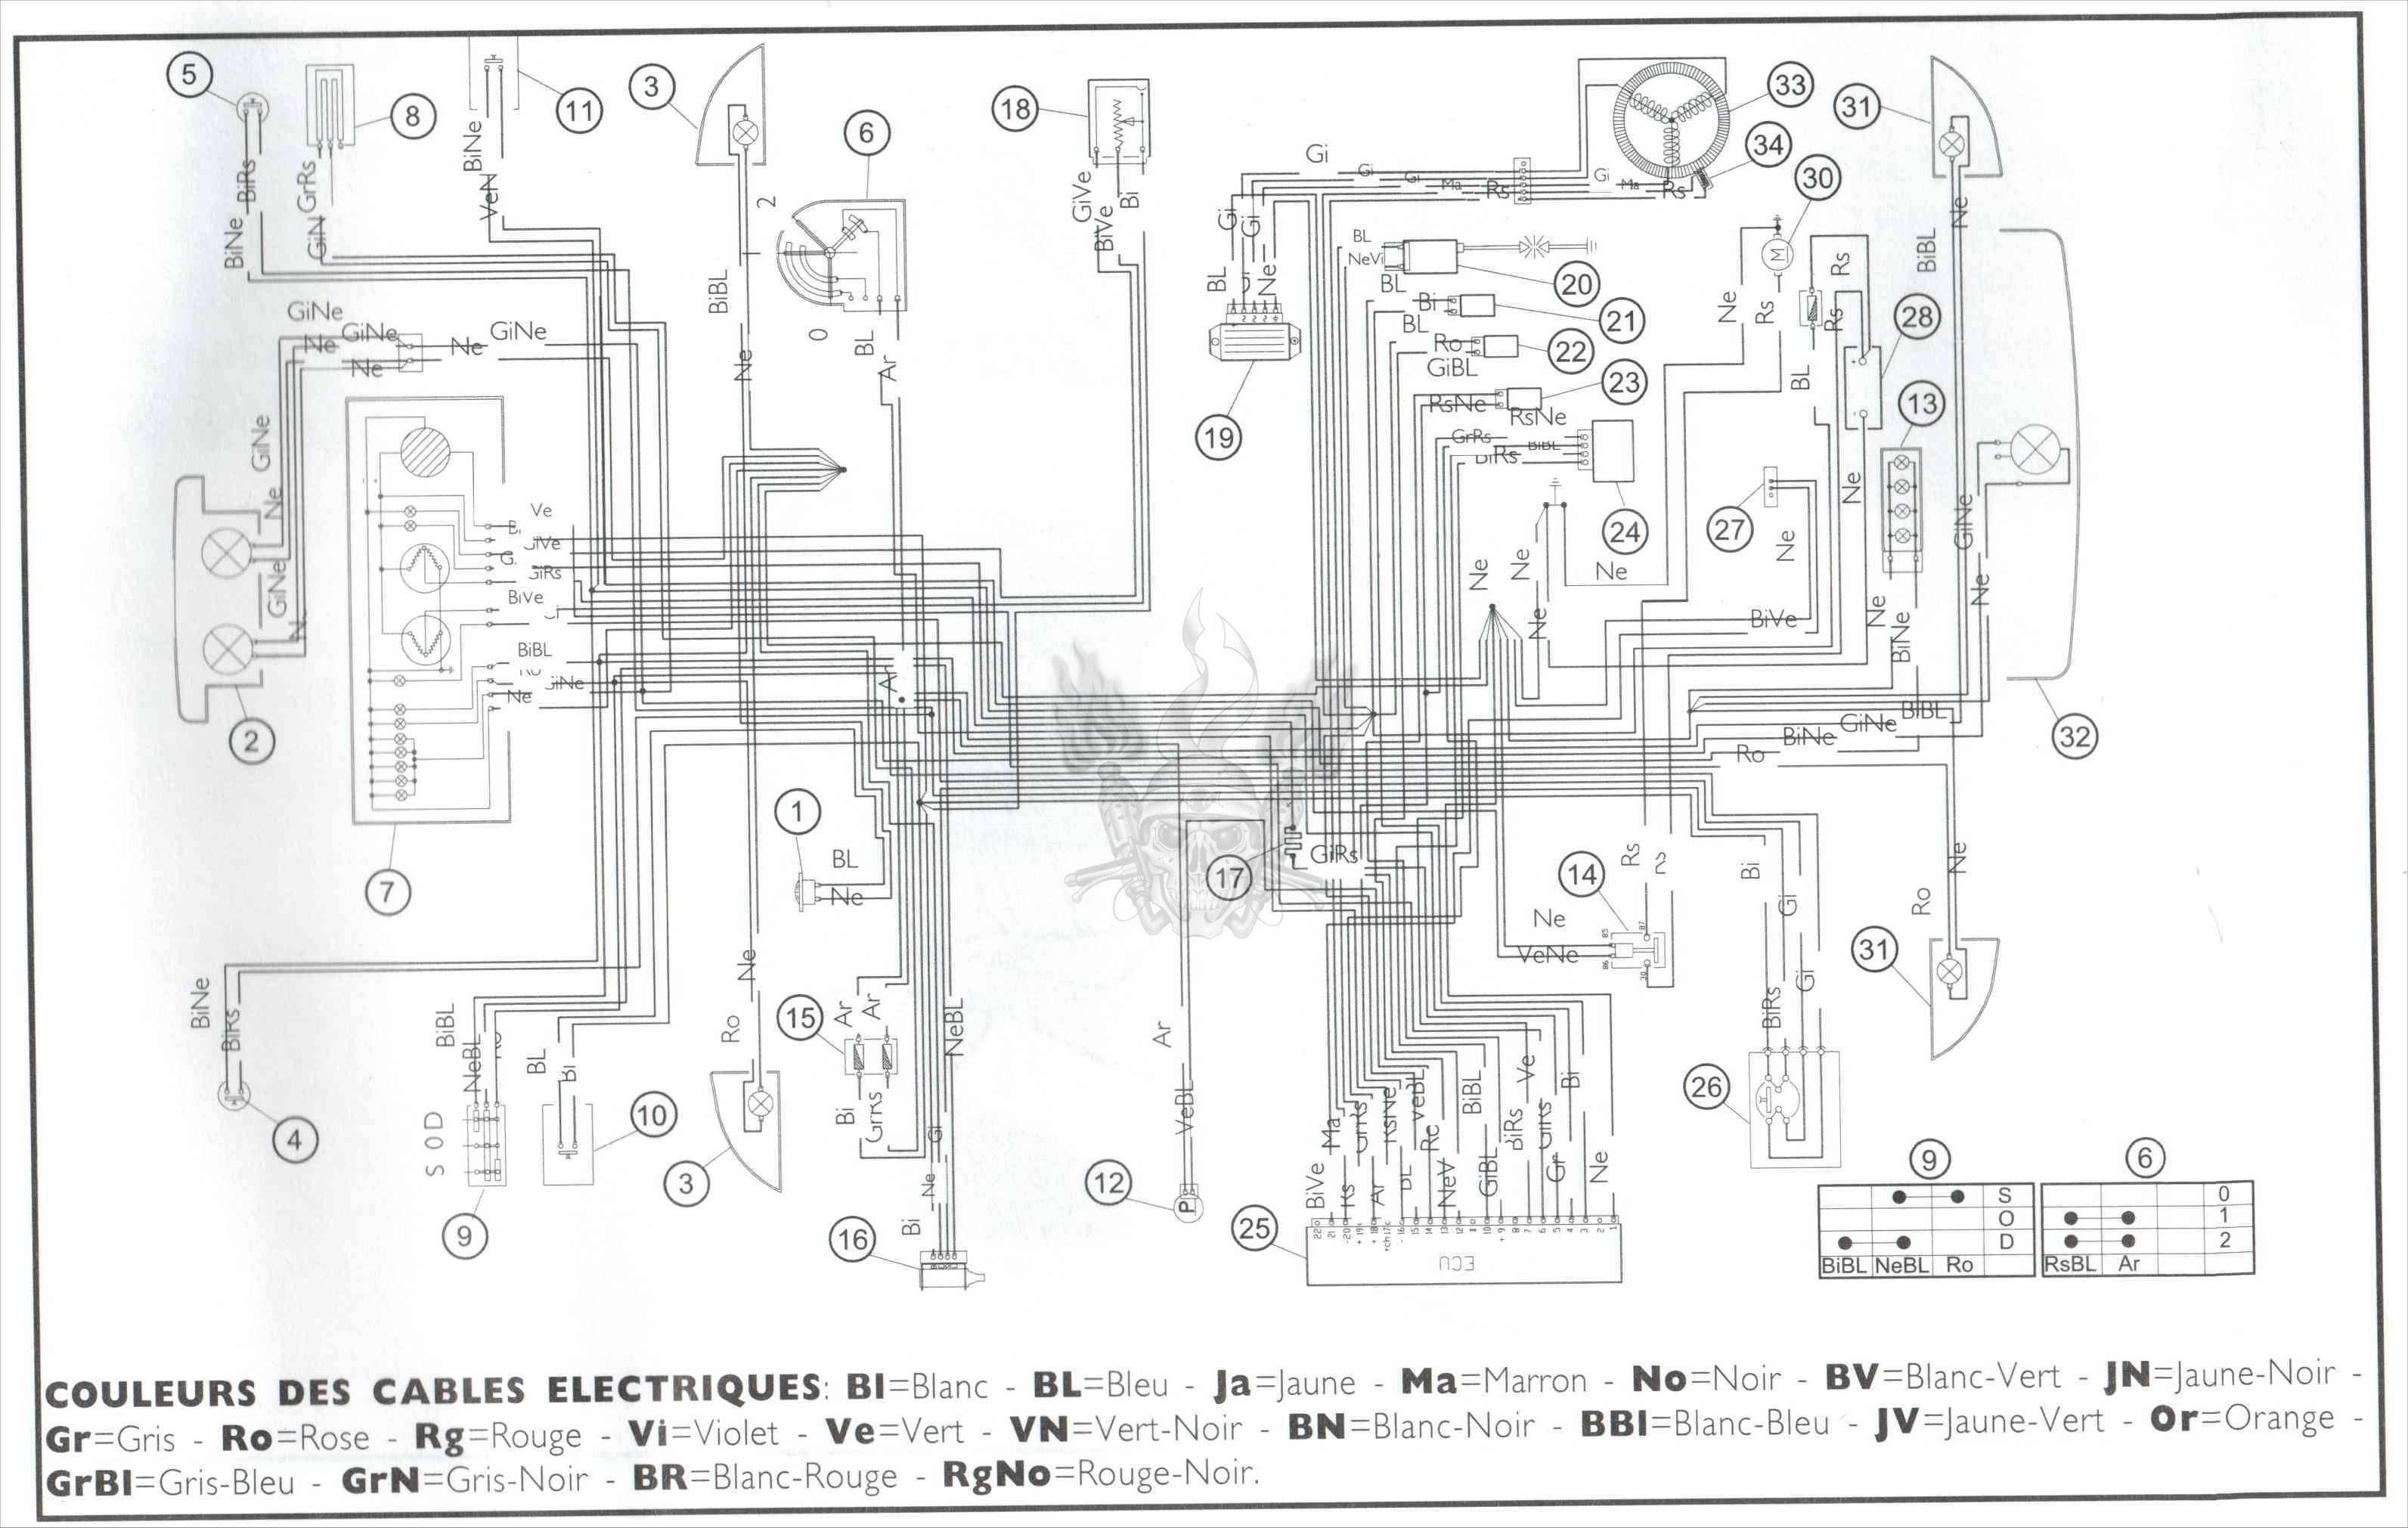 Zero Motorcycle Wiring Diagram Piaggio Motorcycles Manual Pdf Wiring Diagram Amp Fault Codes